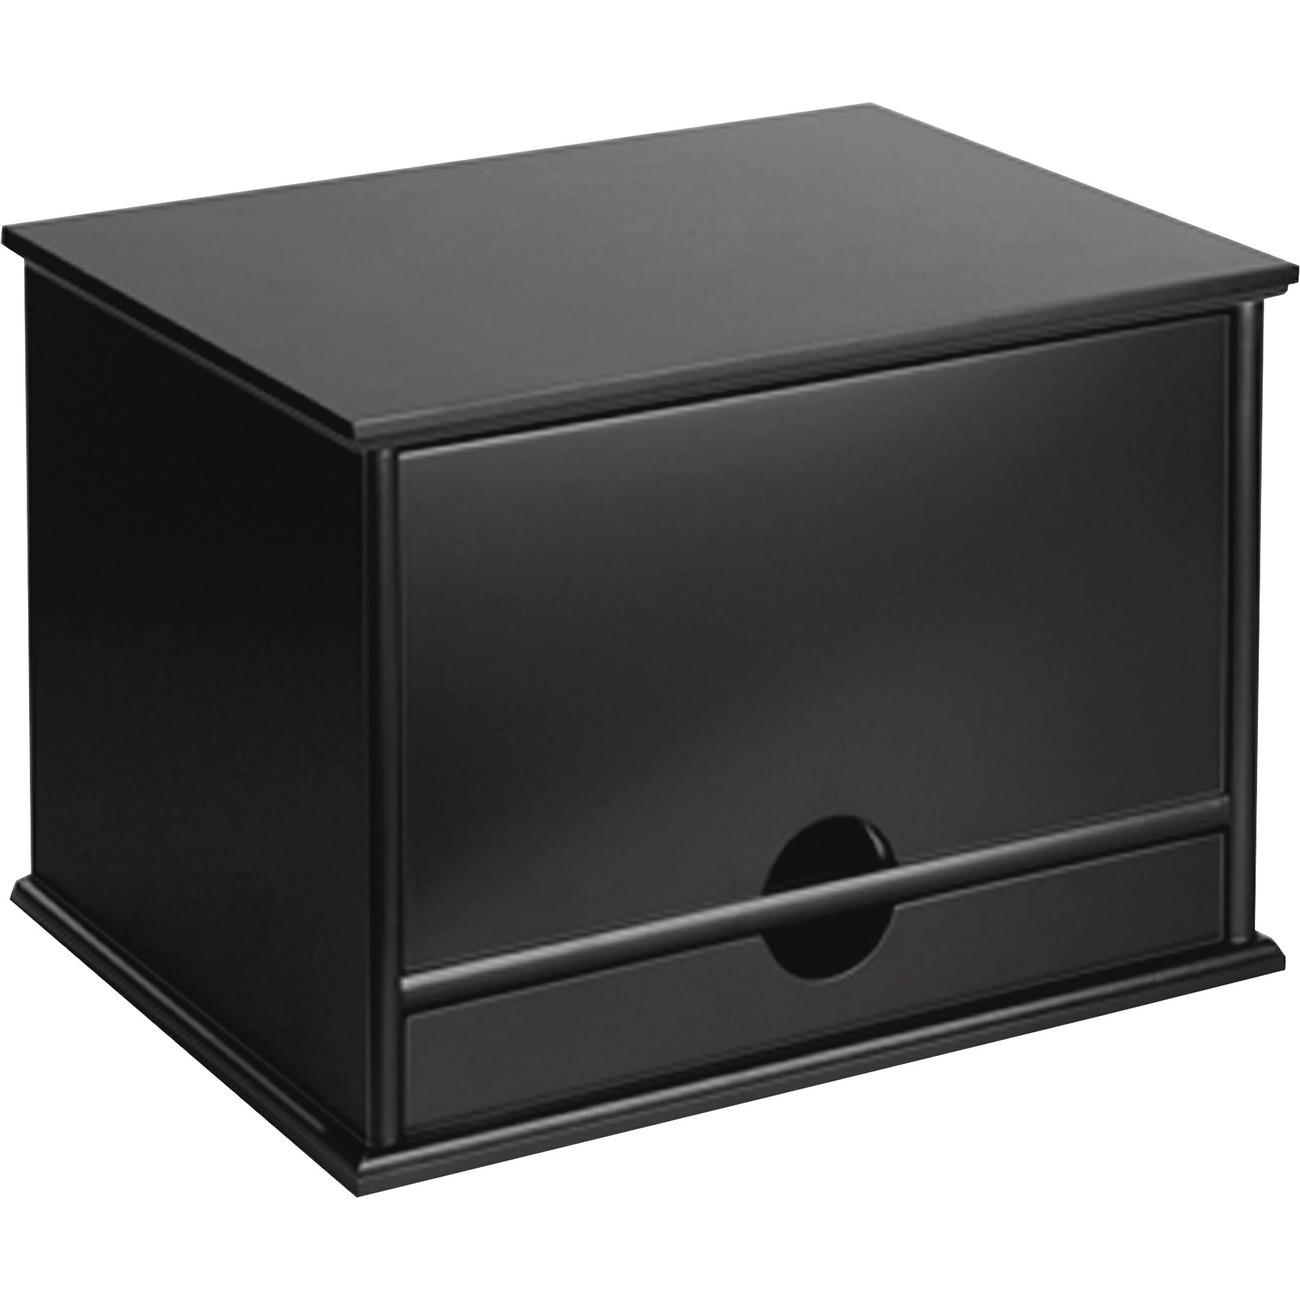 kamloops office systems office supplies desk organizers desktop organizers holders. Black Bedroom Furniture Sets. Home Design Ideas